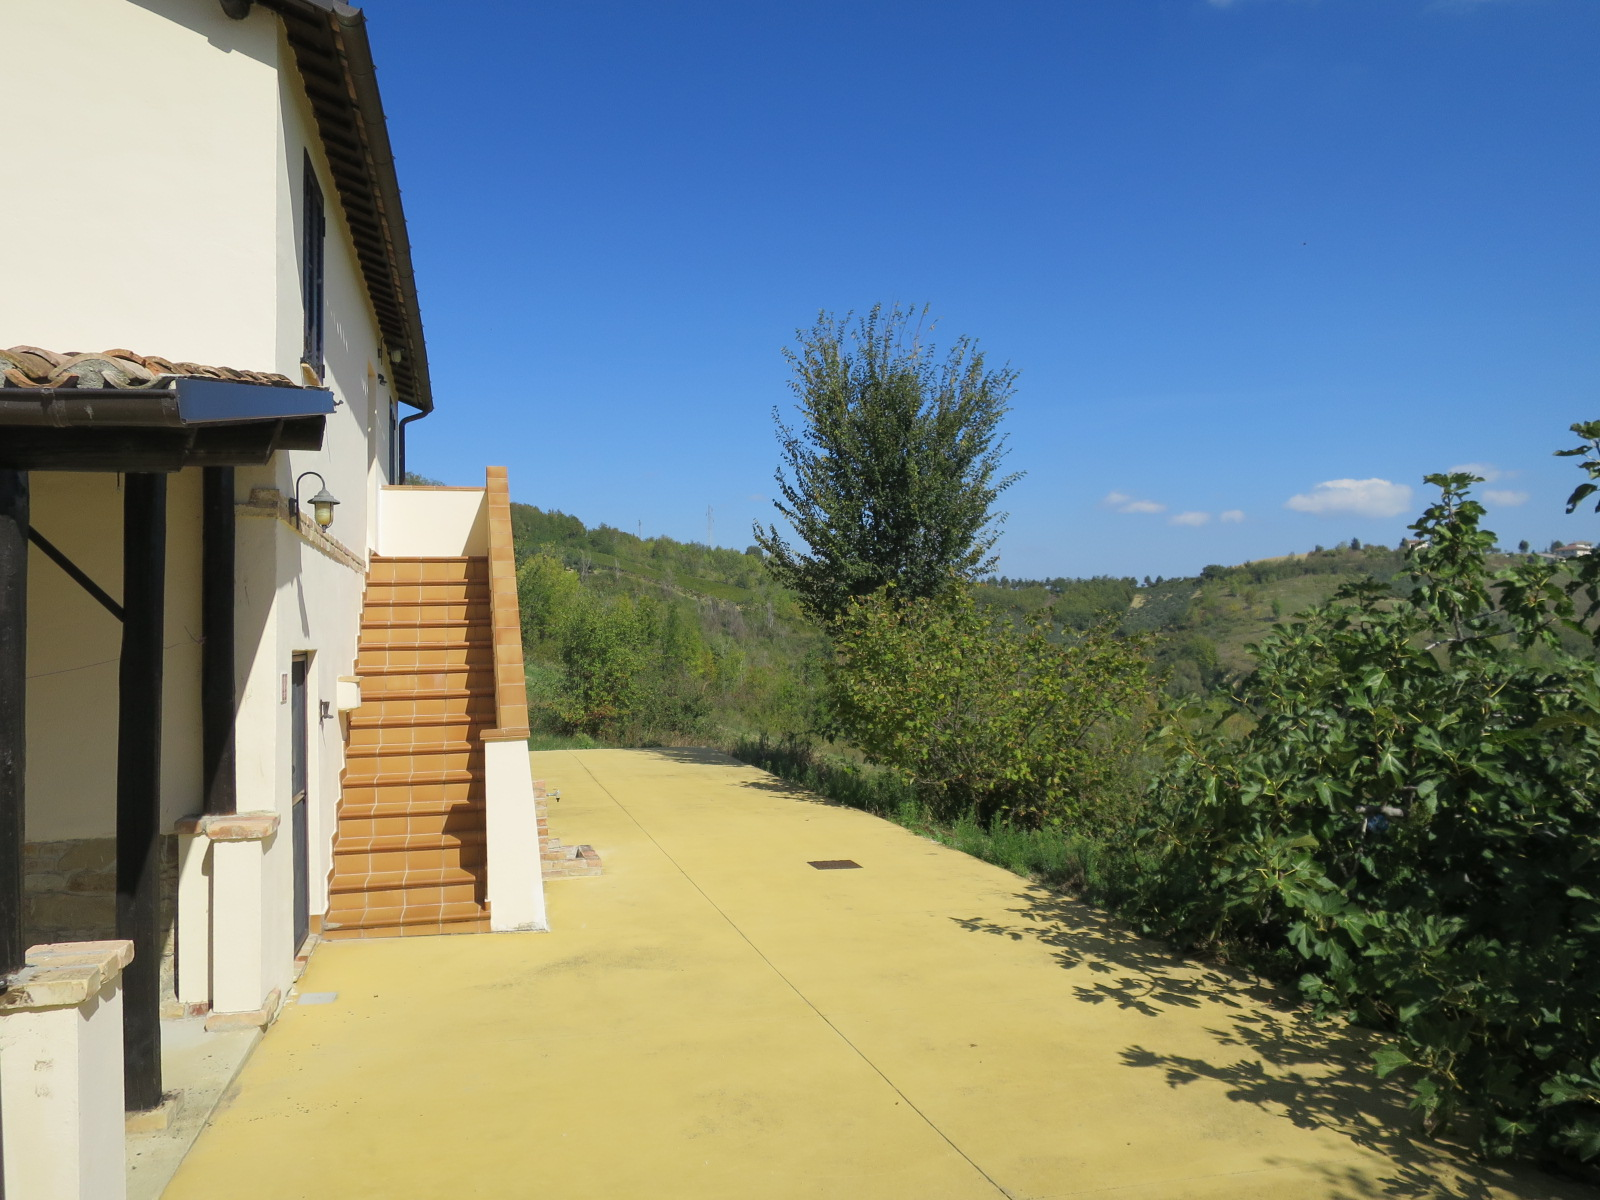 Country Houses Country Houses for sale Montefino (TE), Casa Collina - Montefino - EUR 151.447 270